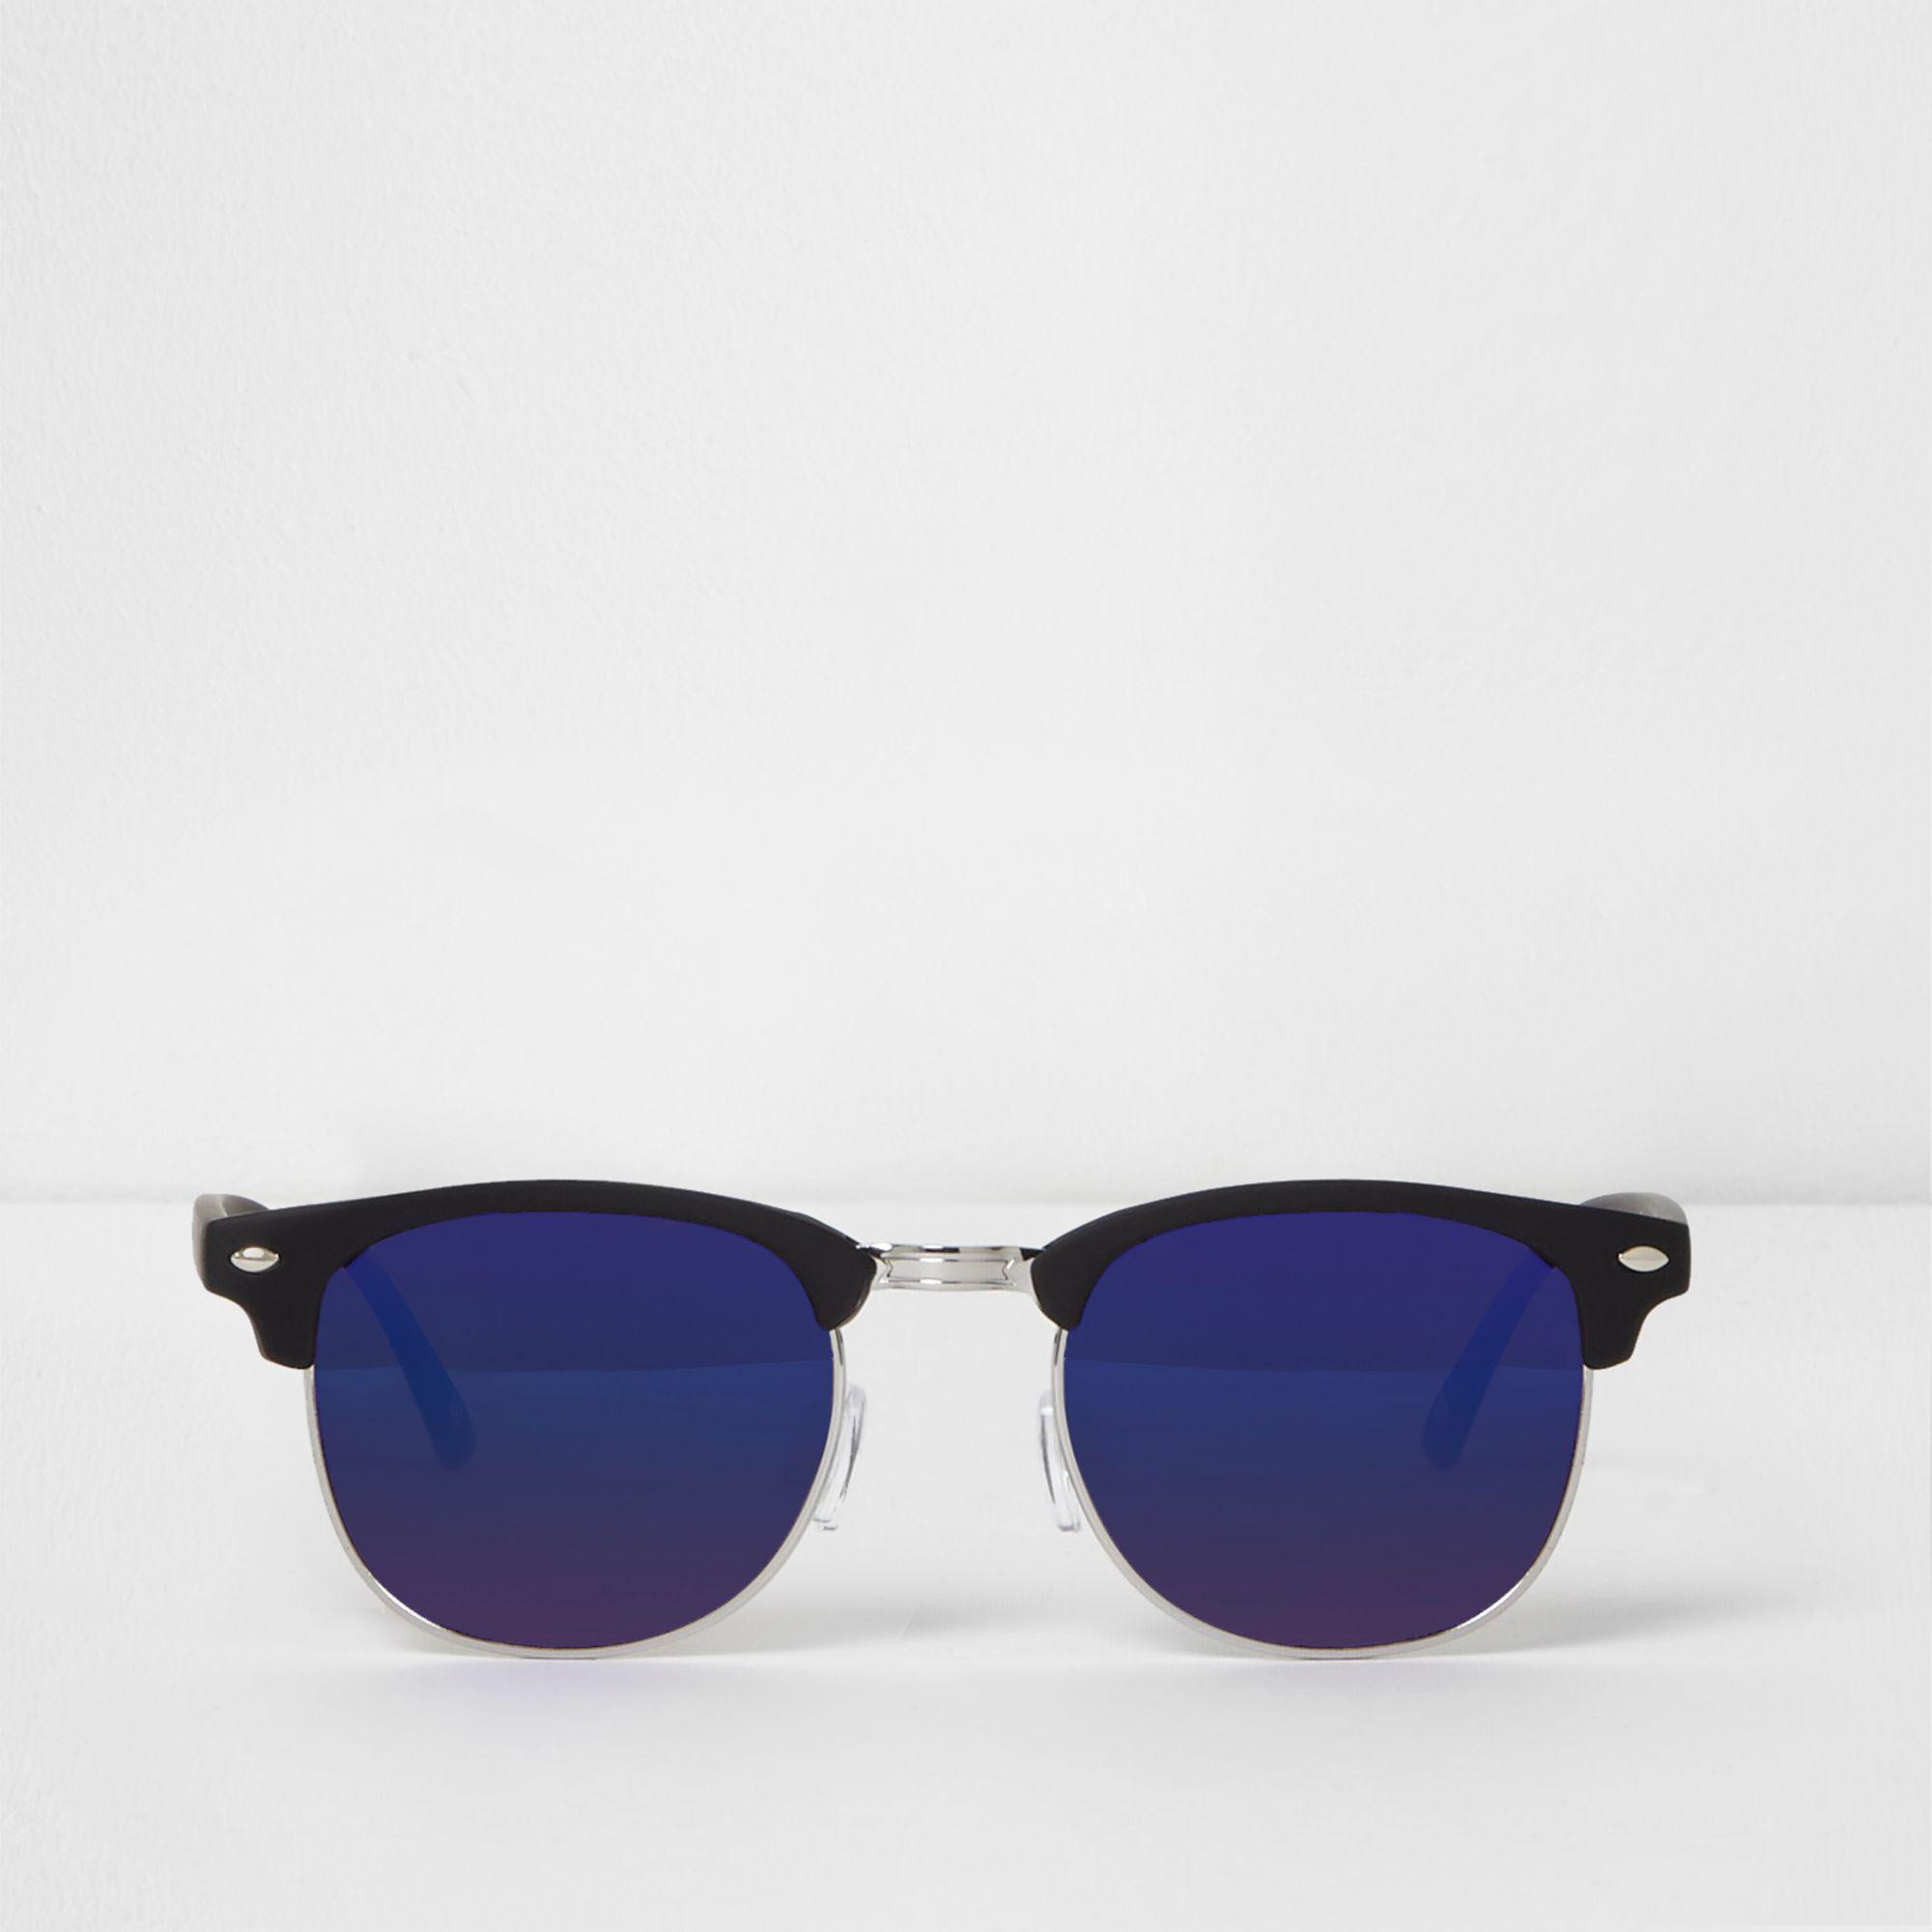 998b176187a River Island Black Half Frame Retro Blue Mirror Sunglasses in Black ...